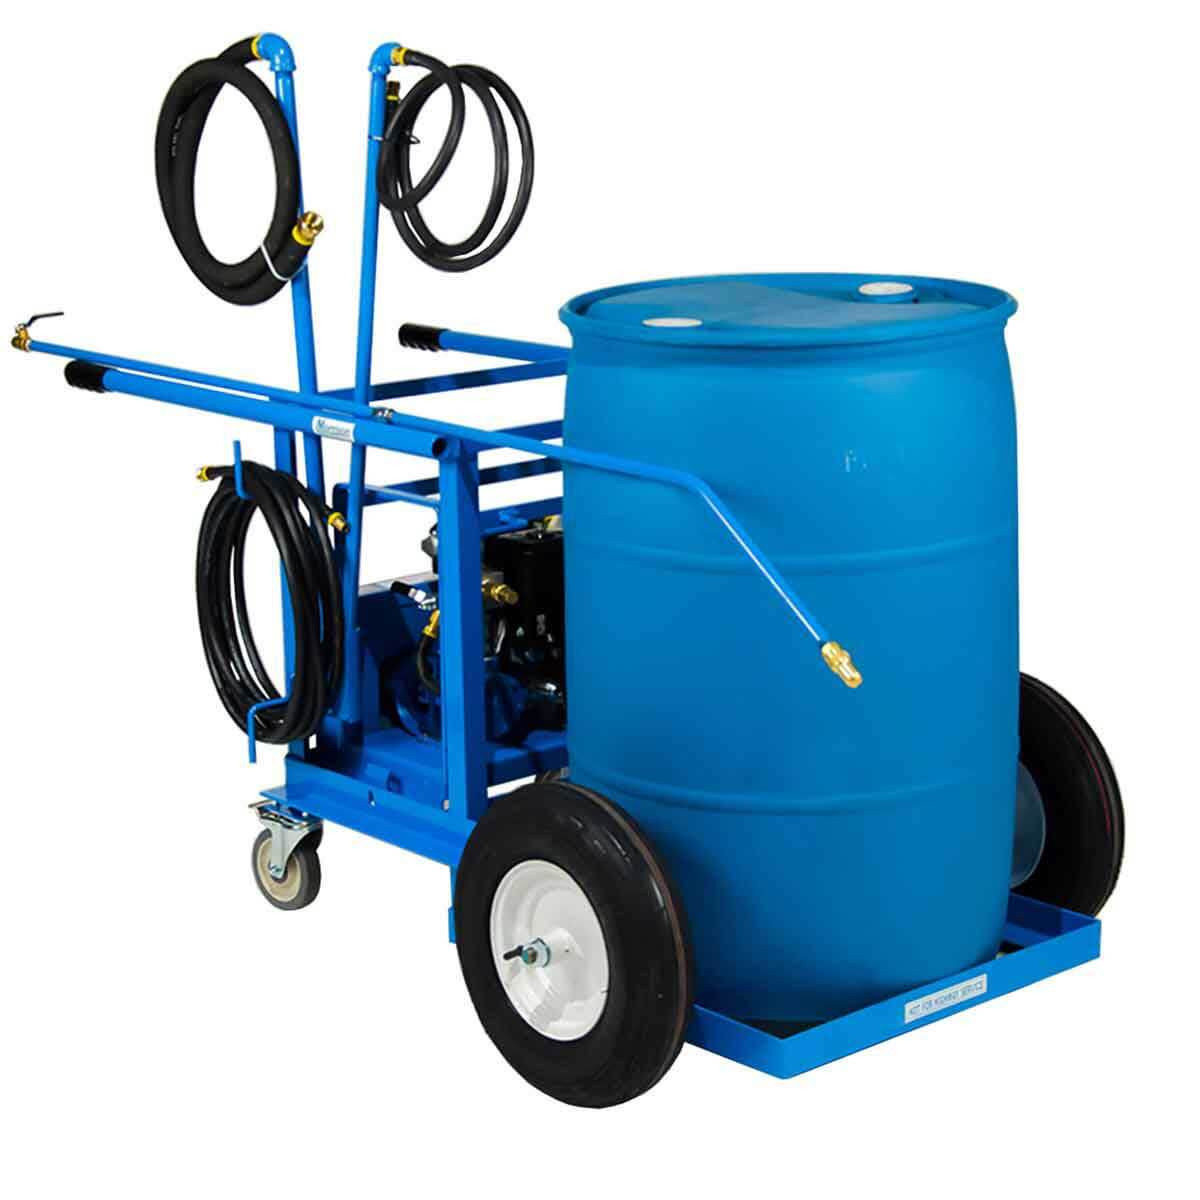 Bartell Power Sprayer Heavy Duty